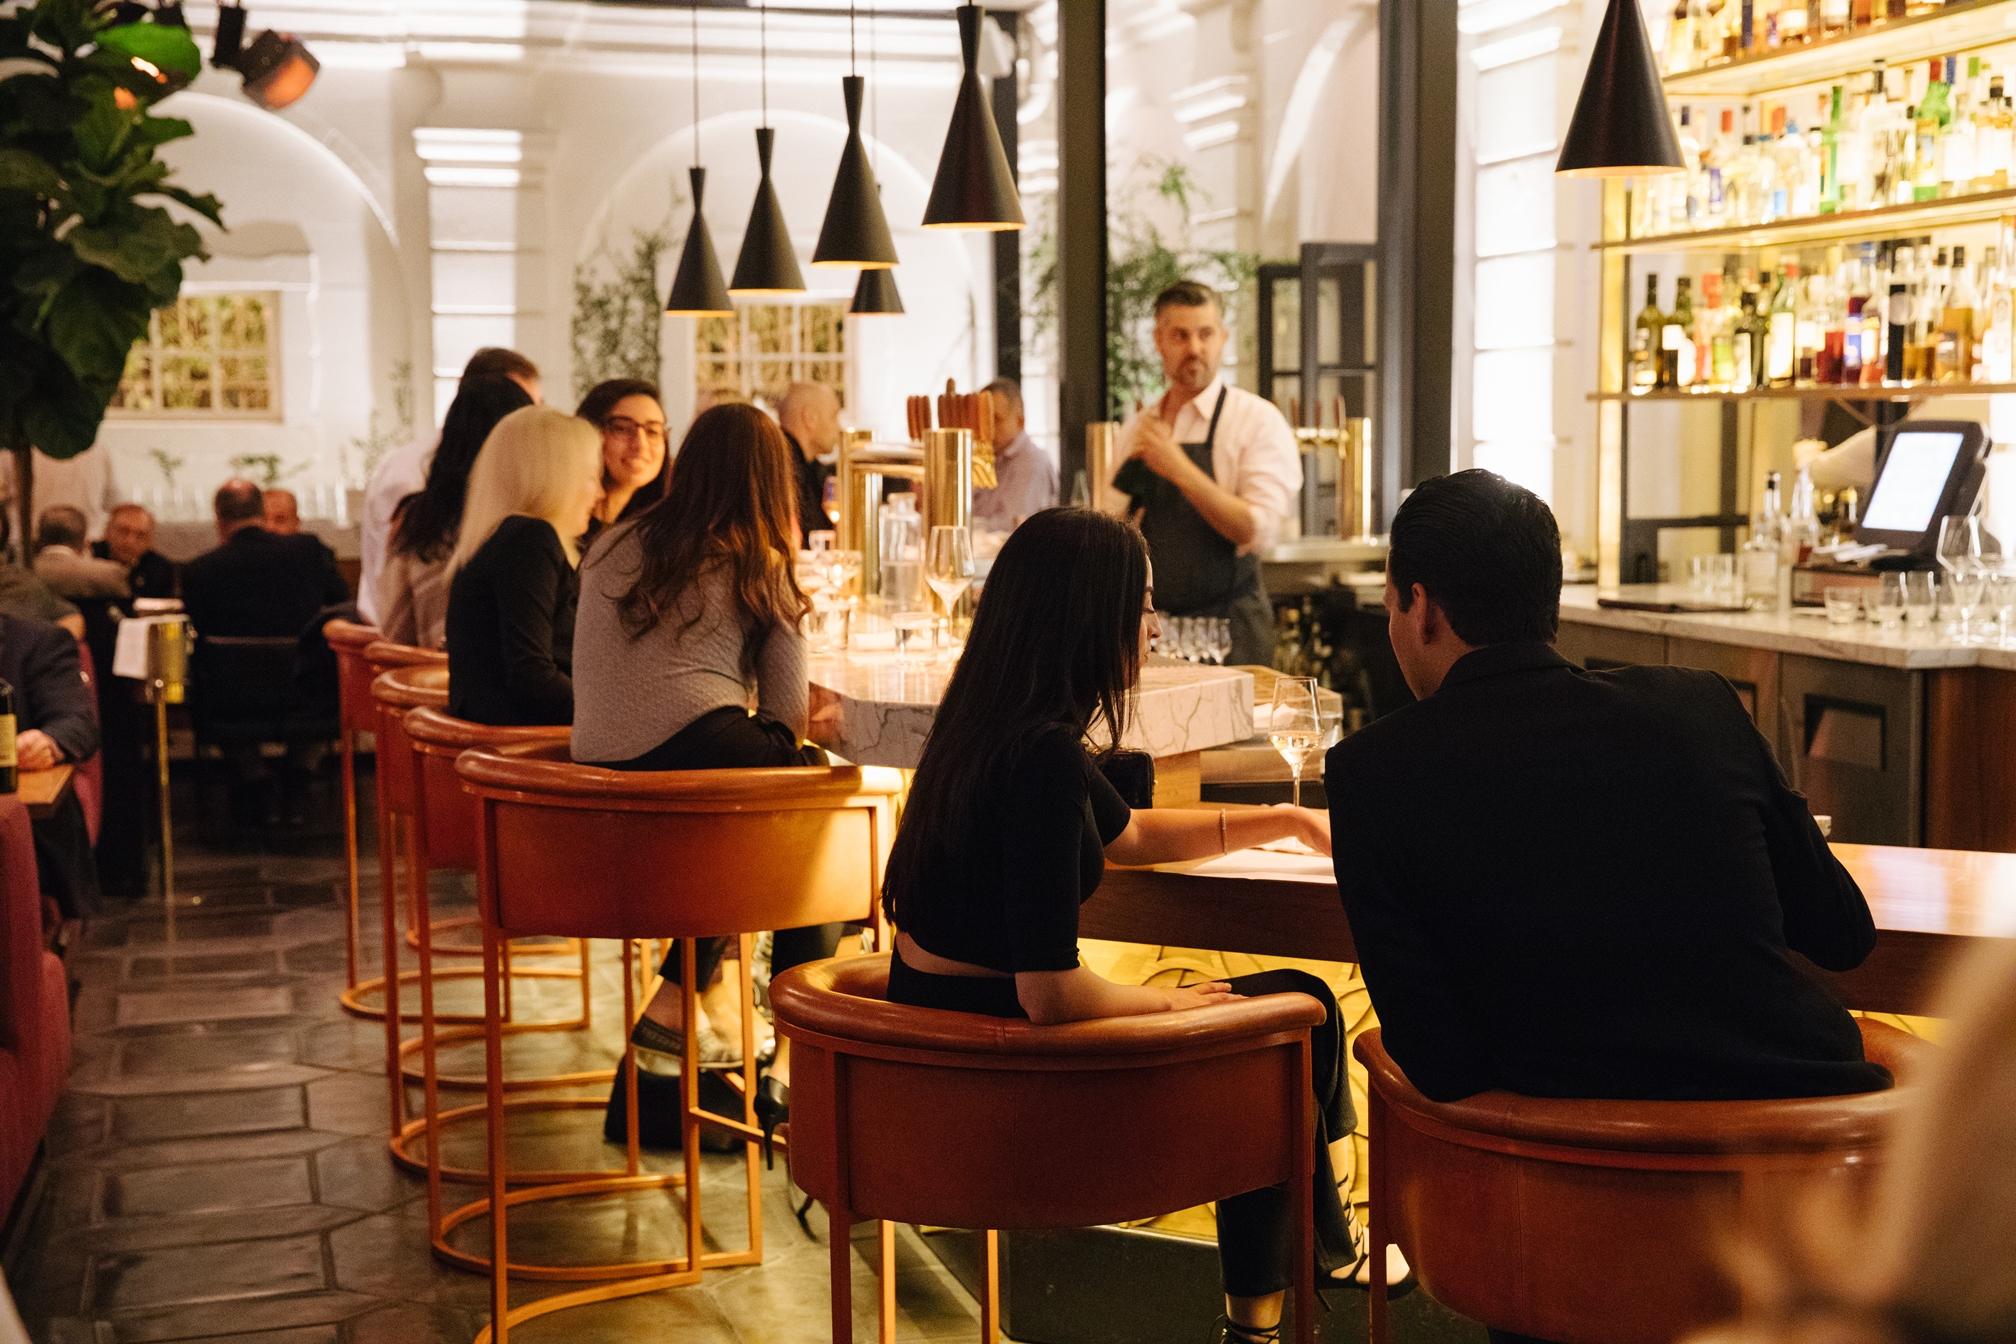 The bar at Redbird